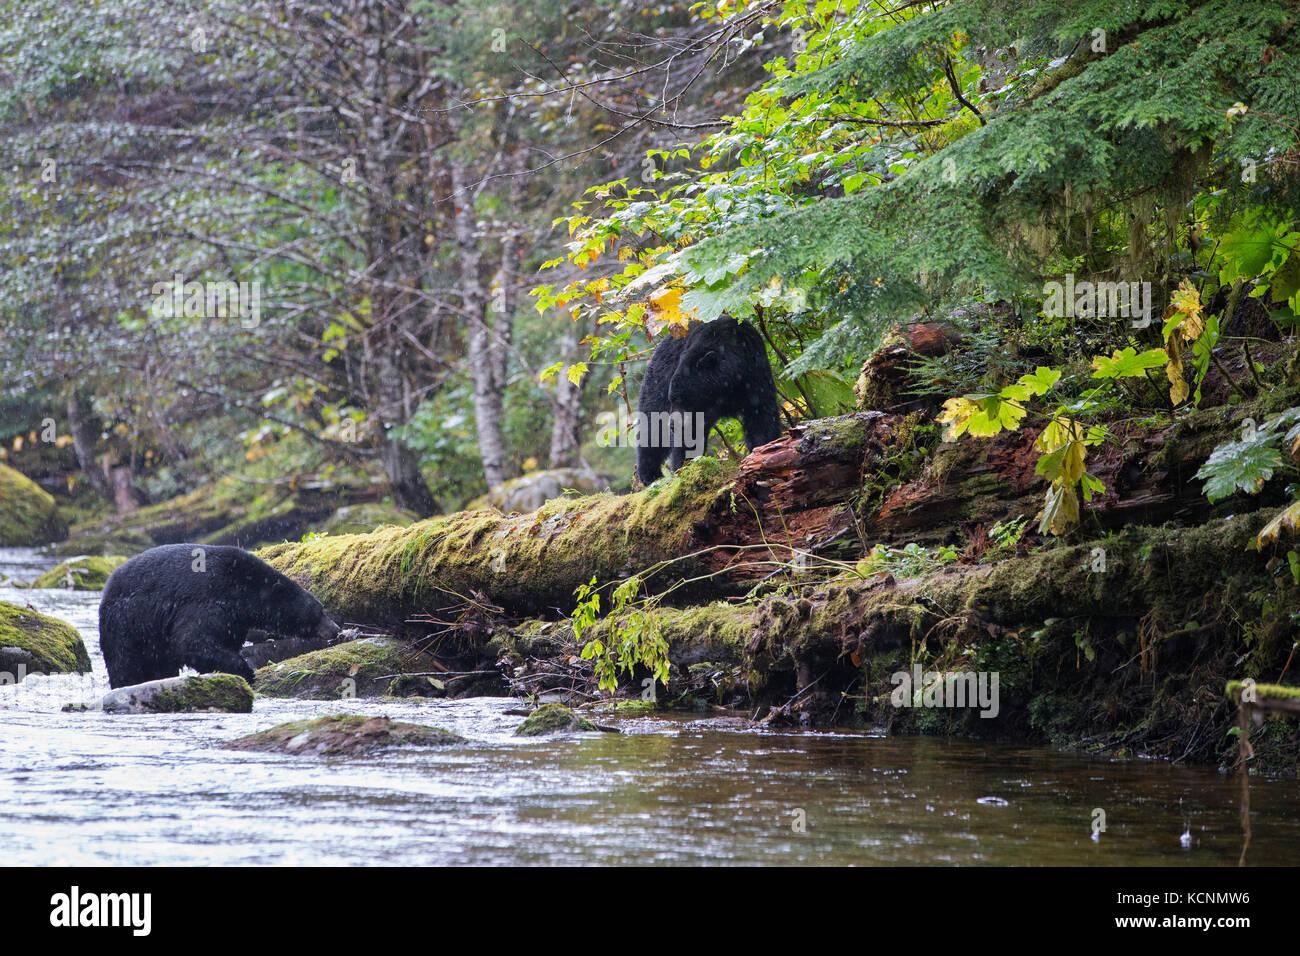 Espíritu oso negro (Ursus americanus kermodei), enfrentamiento entre macho y hembra (inferior) con cachorro Imagen De Stock